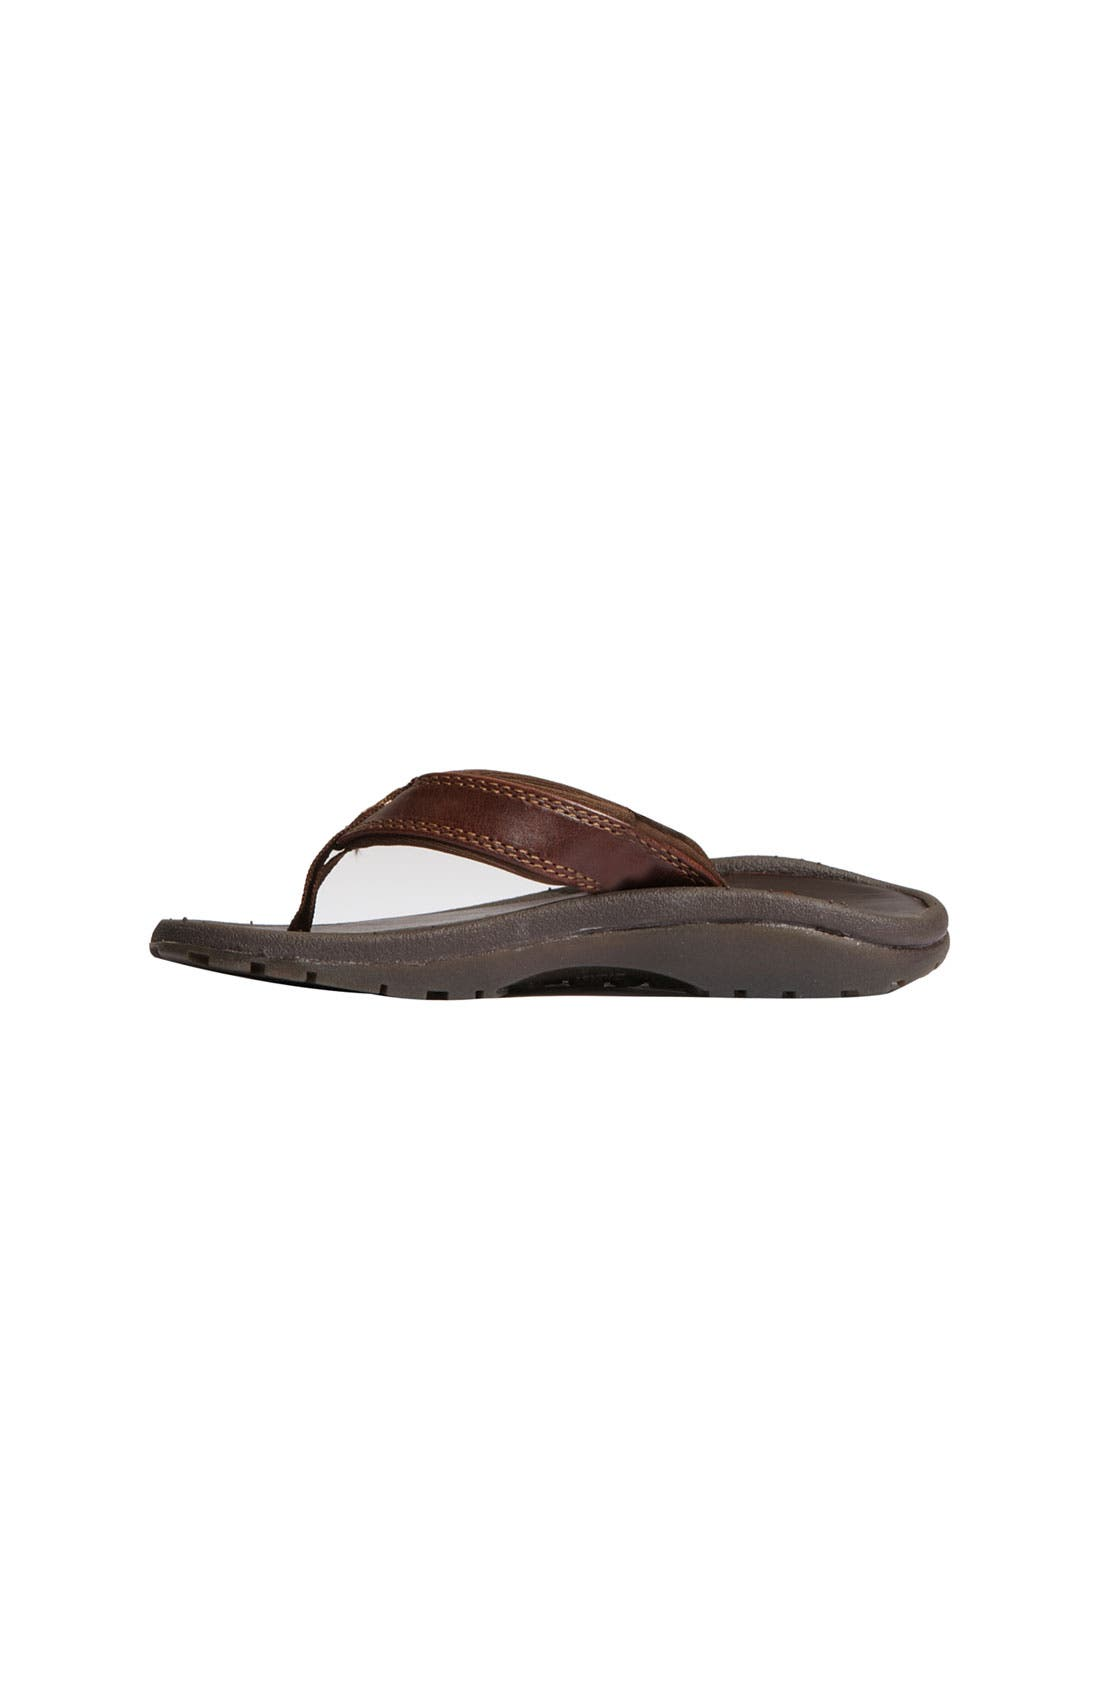 Alternate Image 2  - OluKai 'Ohana' Leather Sandal (Toddler, Little Kid & Big Kid)